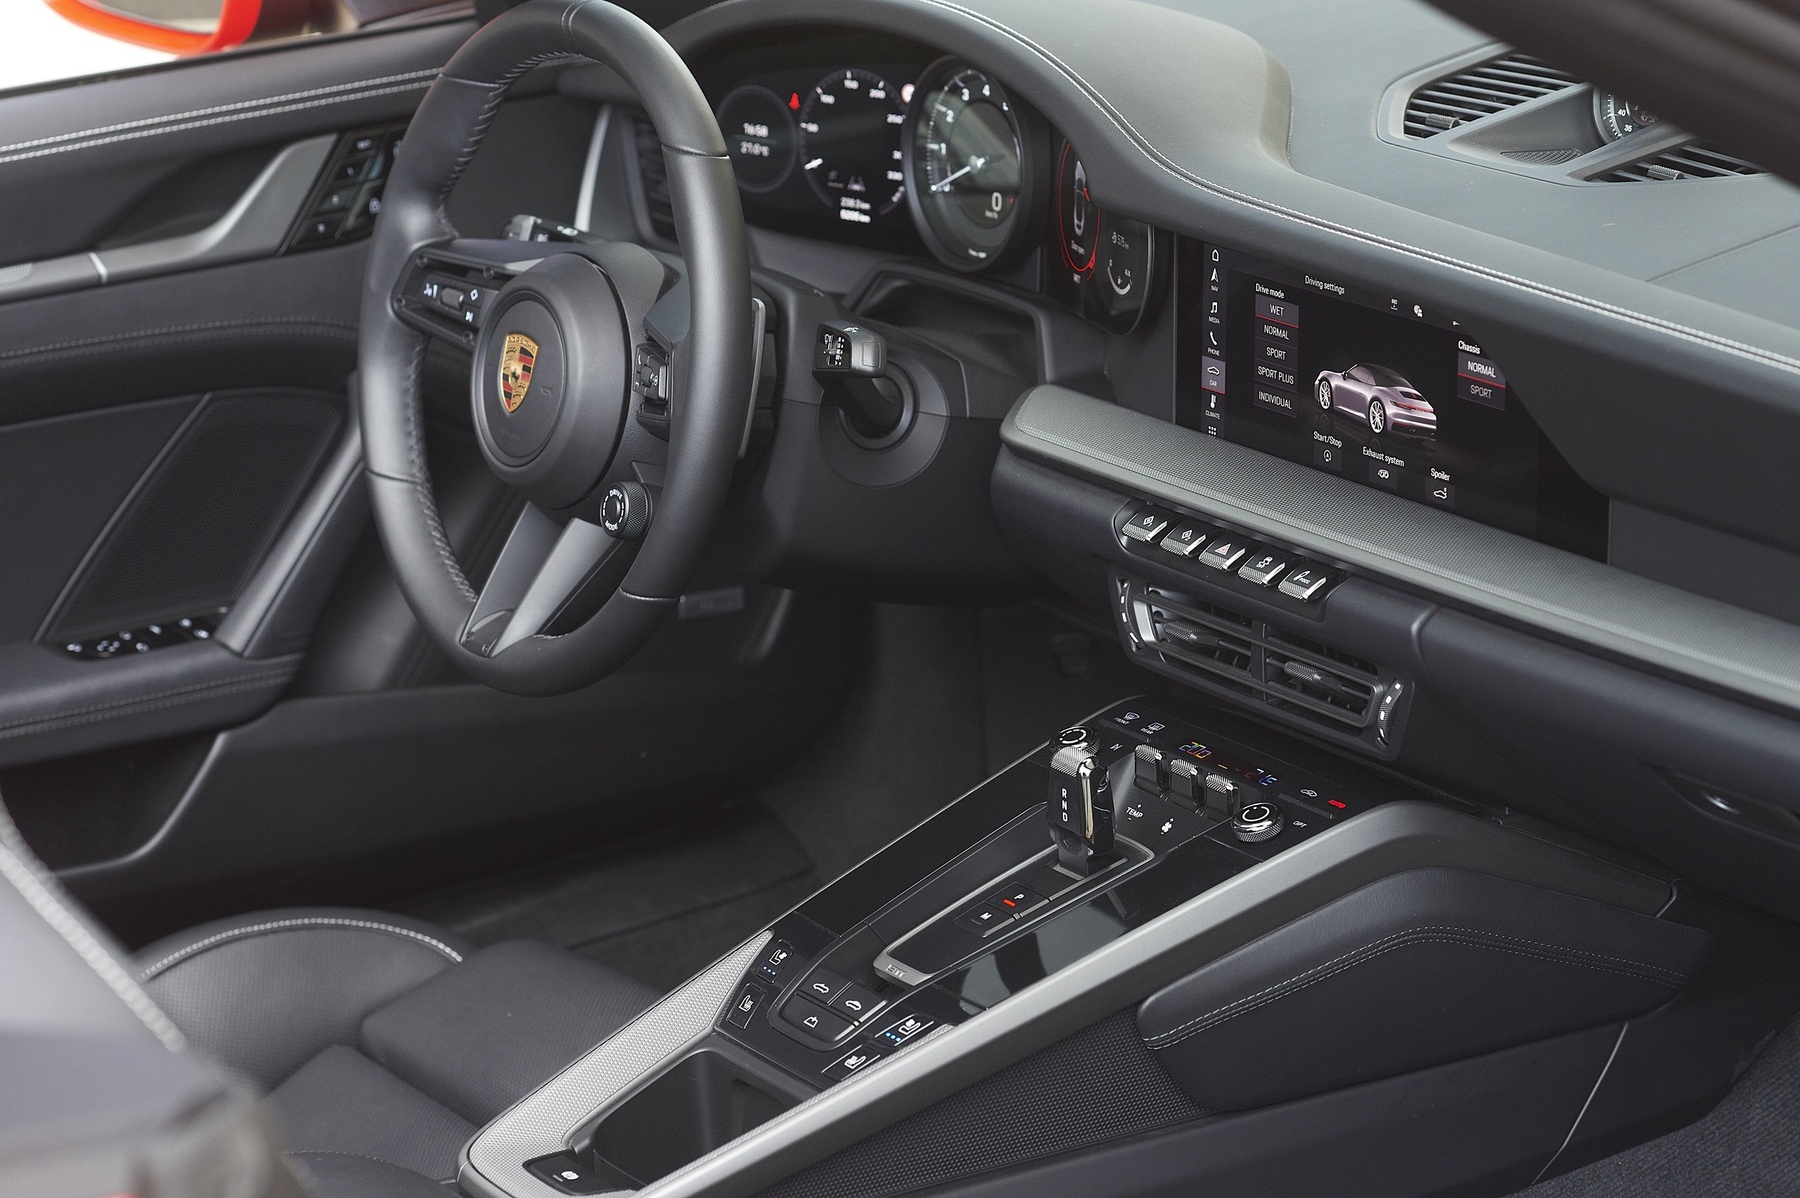 Test_Drive_Porsche_911_Athens_0157